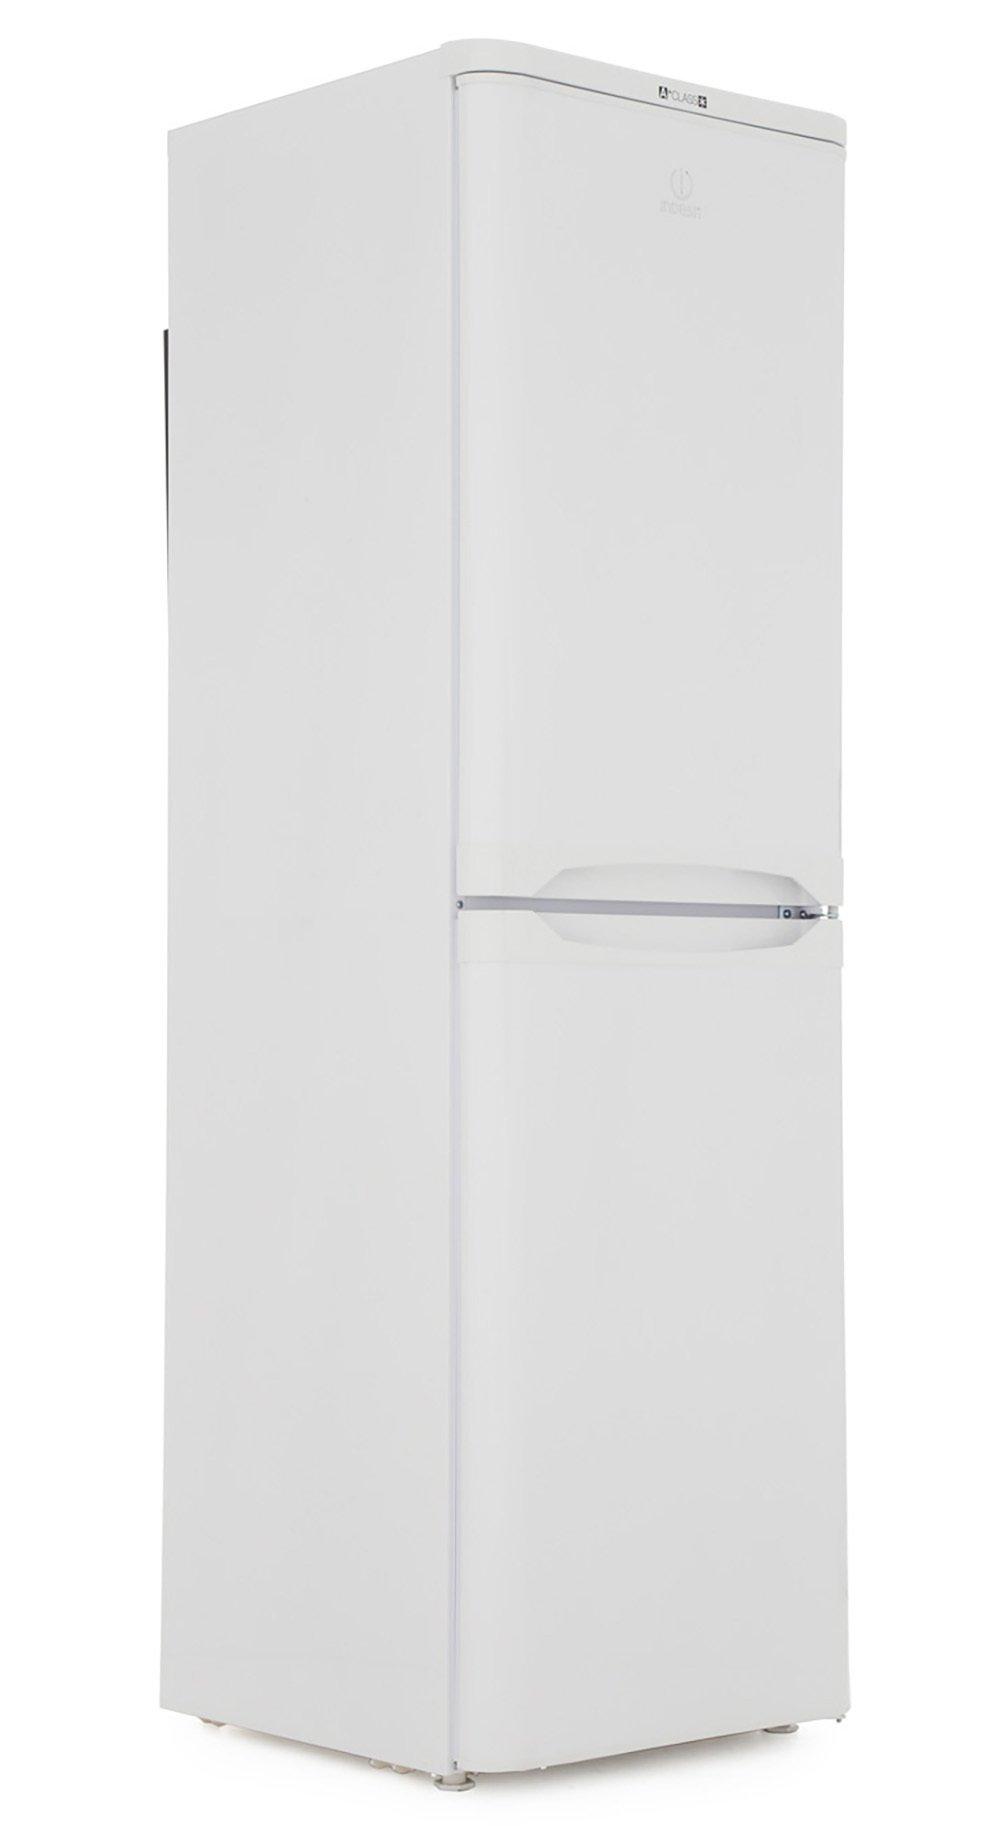 Indesit IBD5517W Low Frost Fridge Freezer